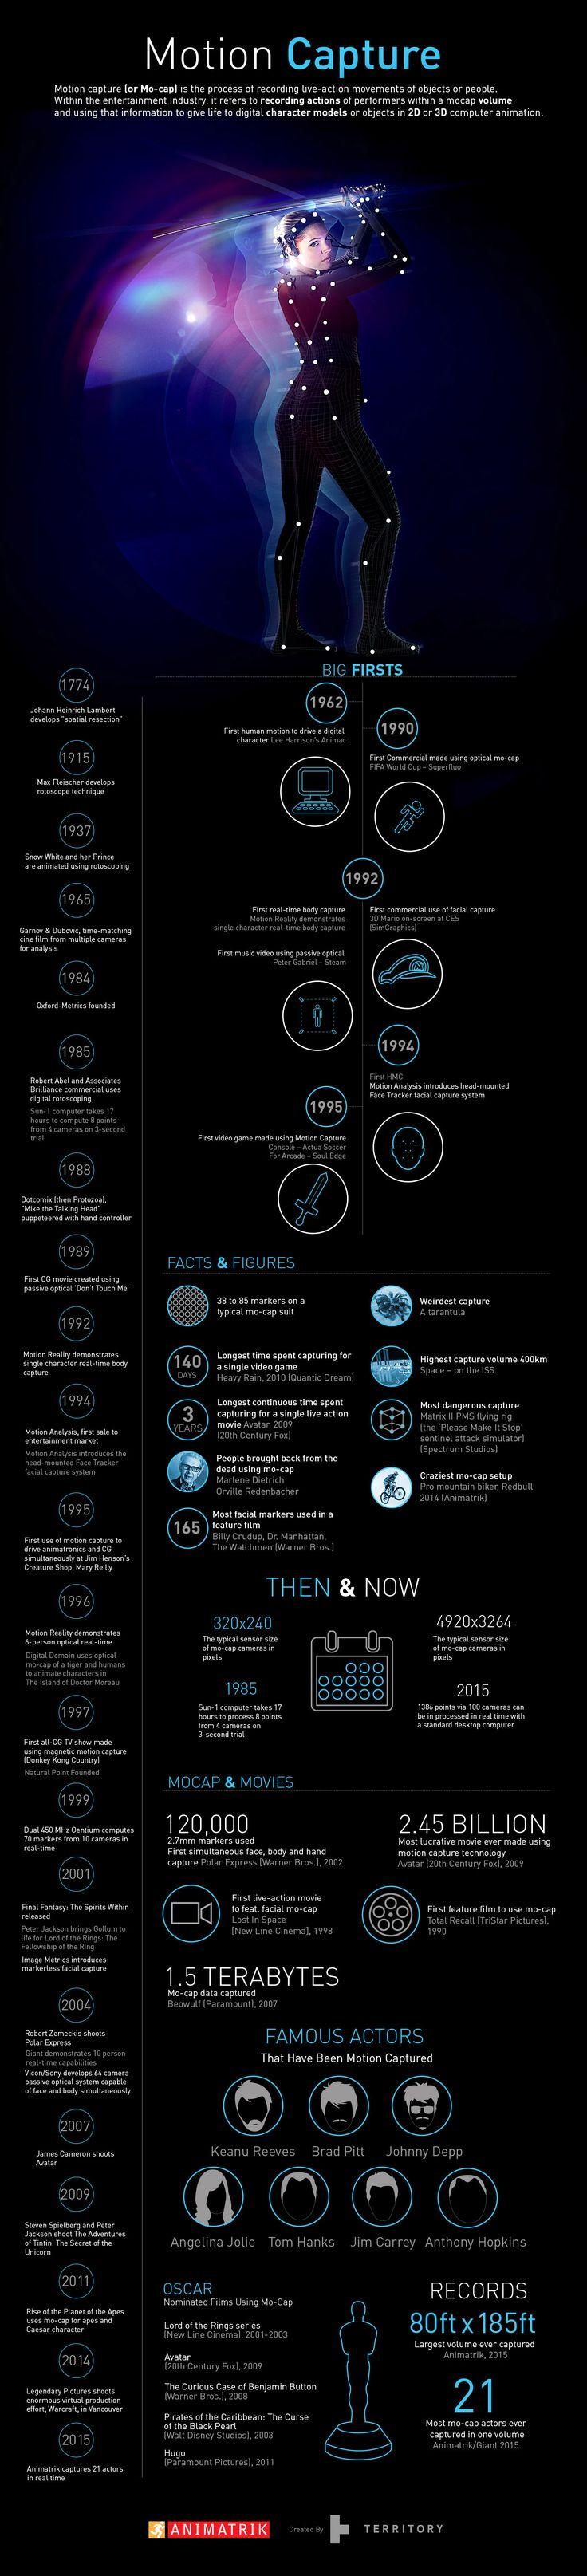 Animatrik-motion-capture-infographic-2016